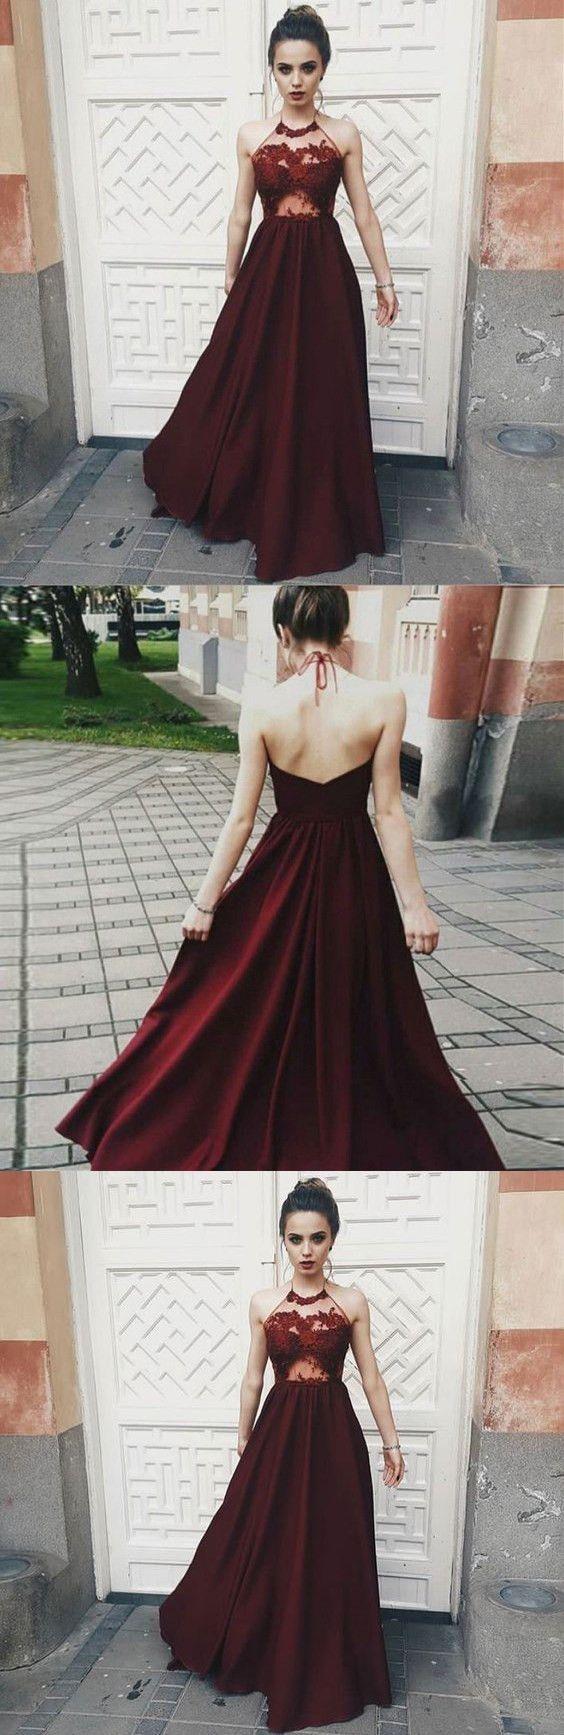 Opening back sexy prom dress dark red illusion bodice halter long